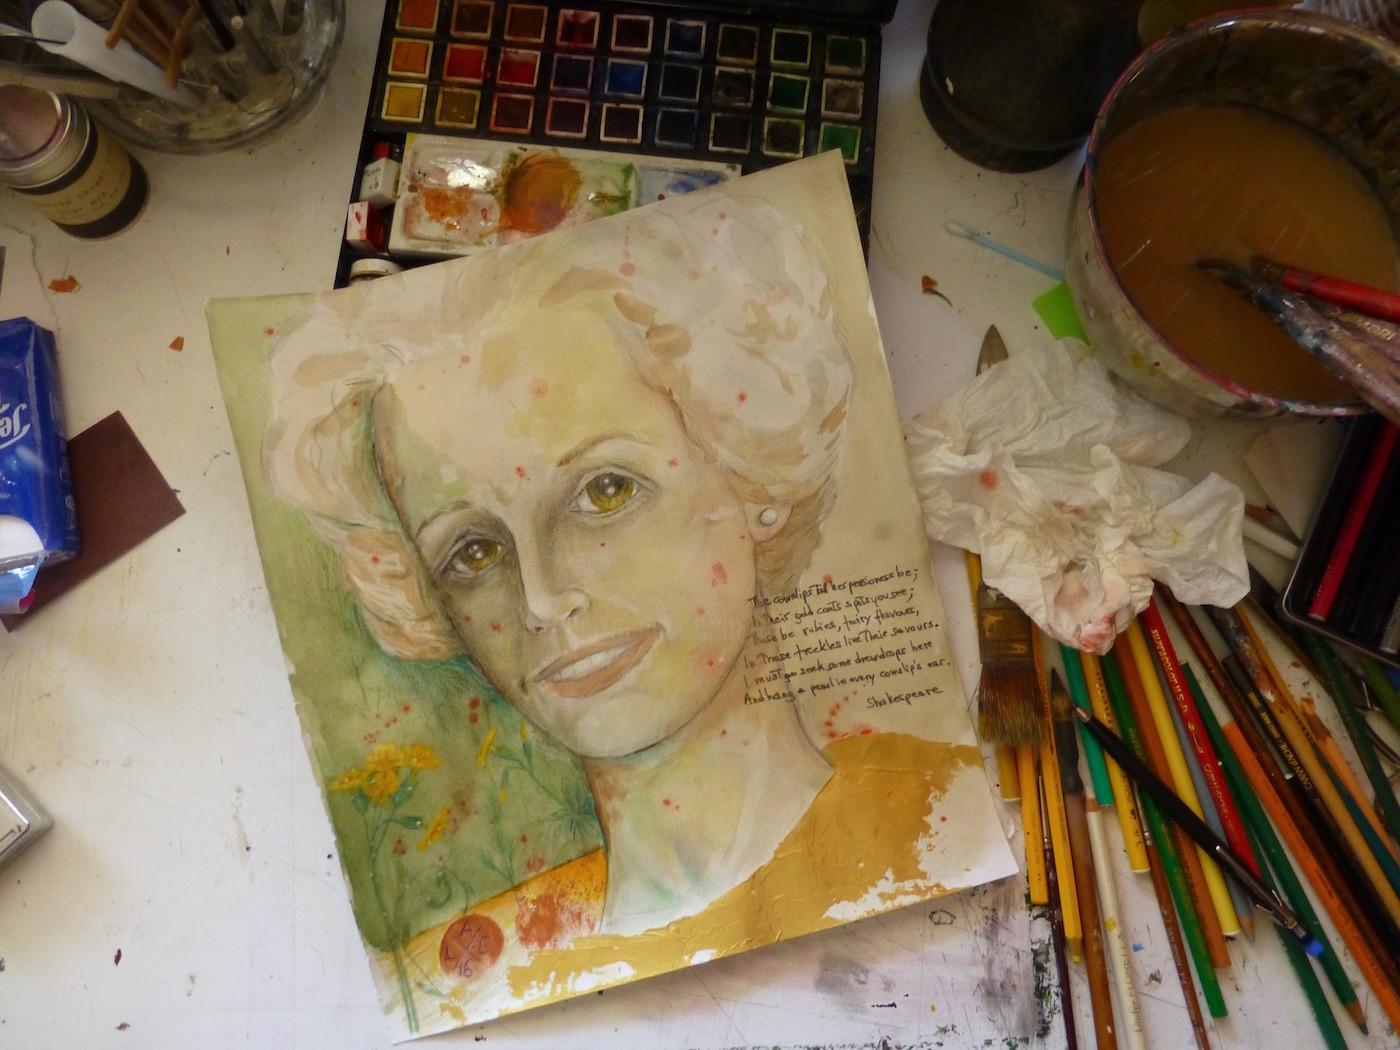 Livia Alessandrini - RUBIES AND FRECKLES (my Mother)-workinprogress